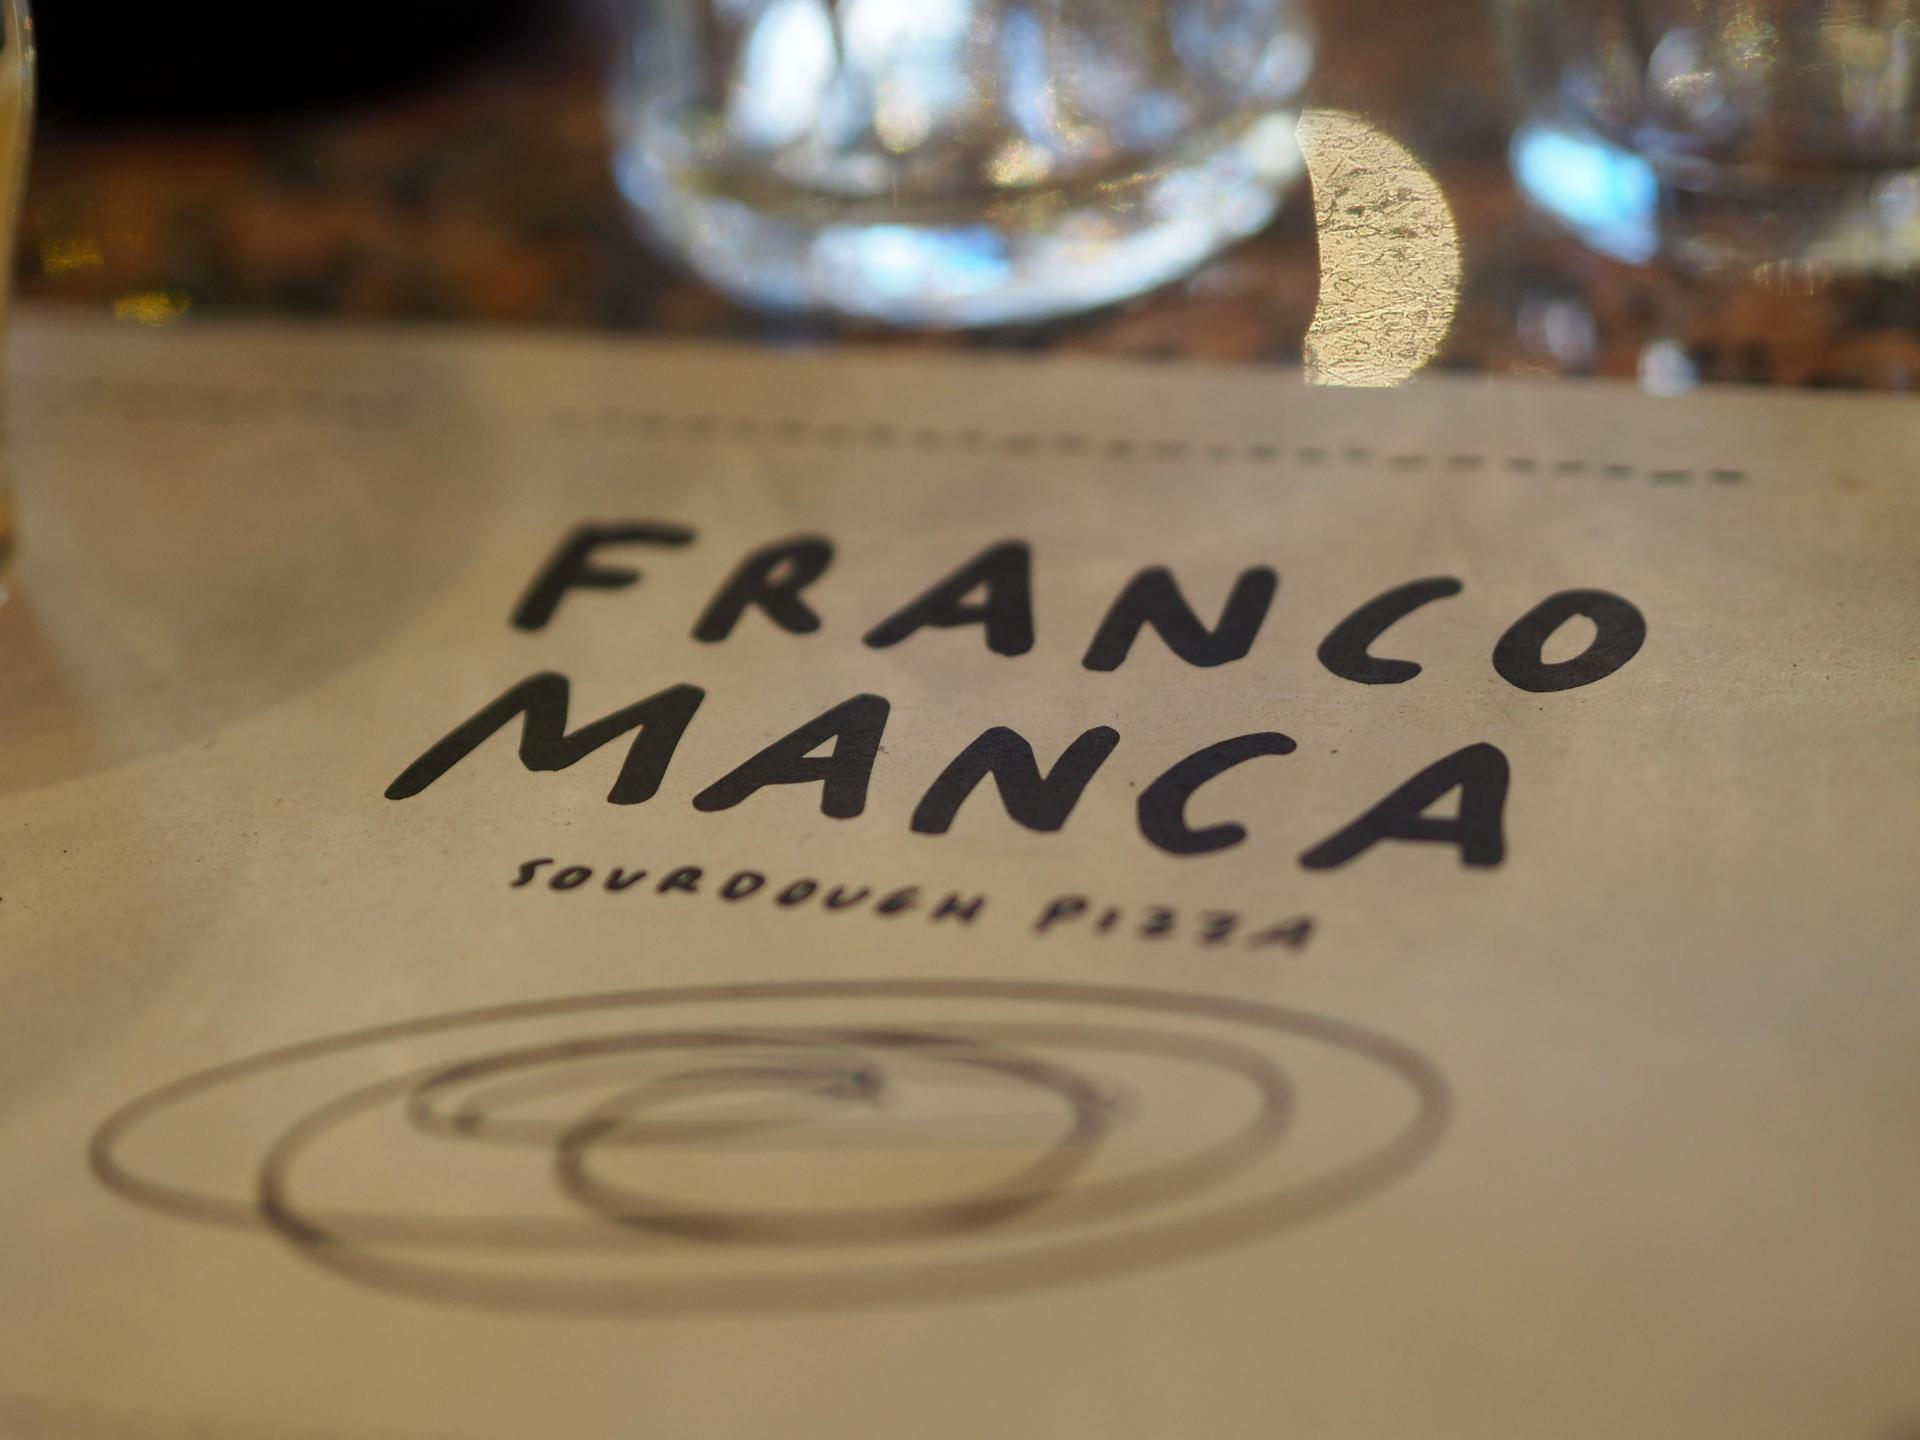 Franco Manca, Brighton Marina – The Best Pizza?